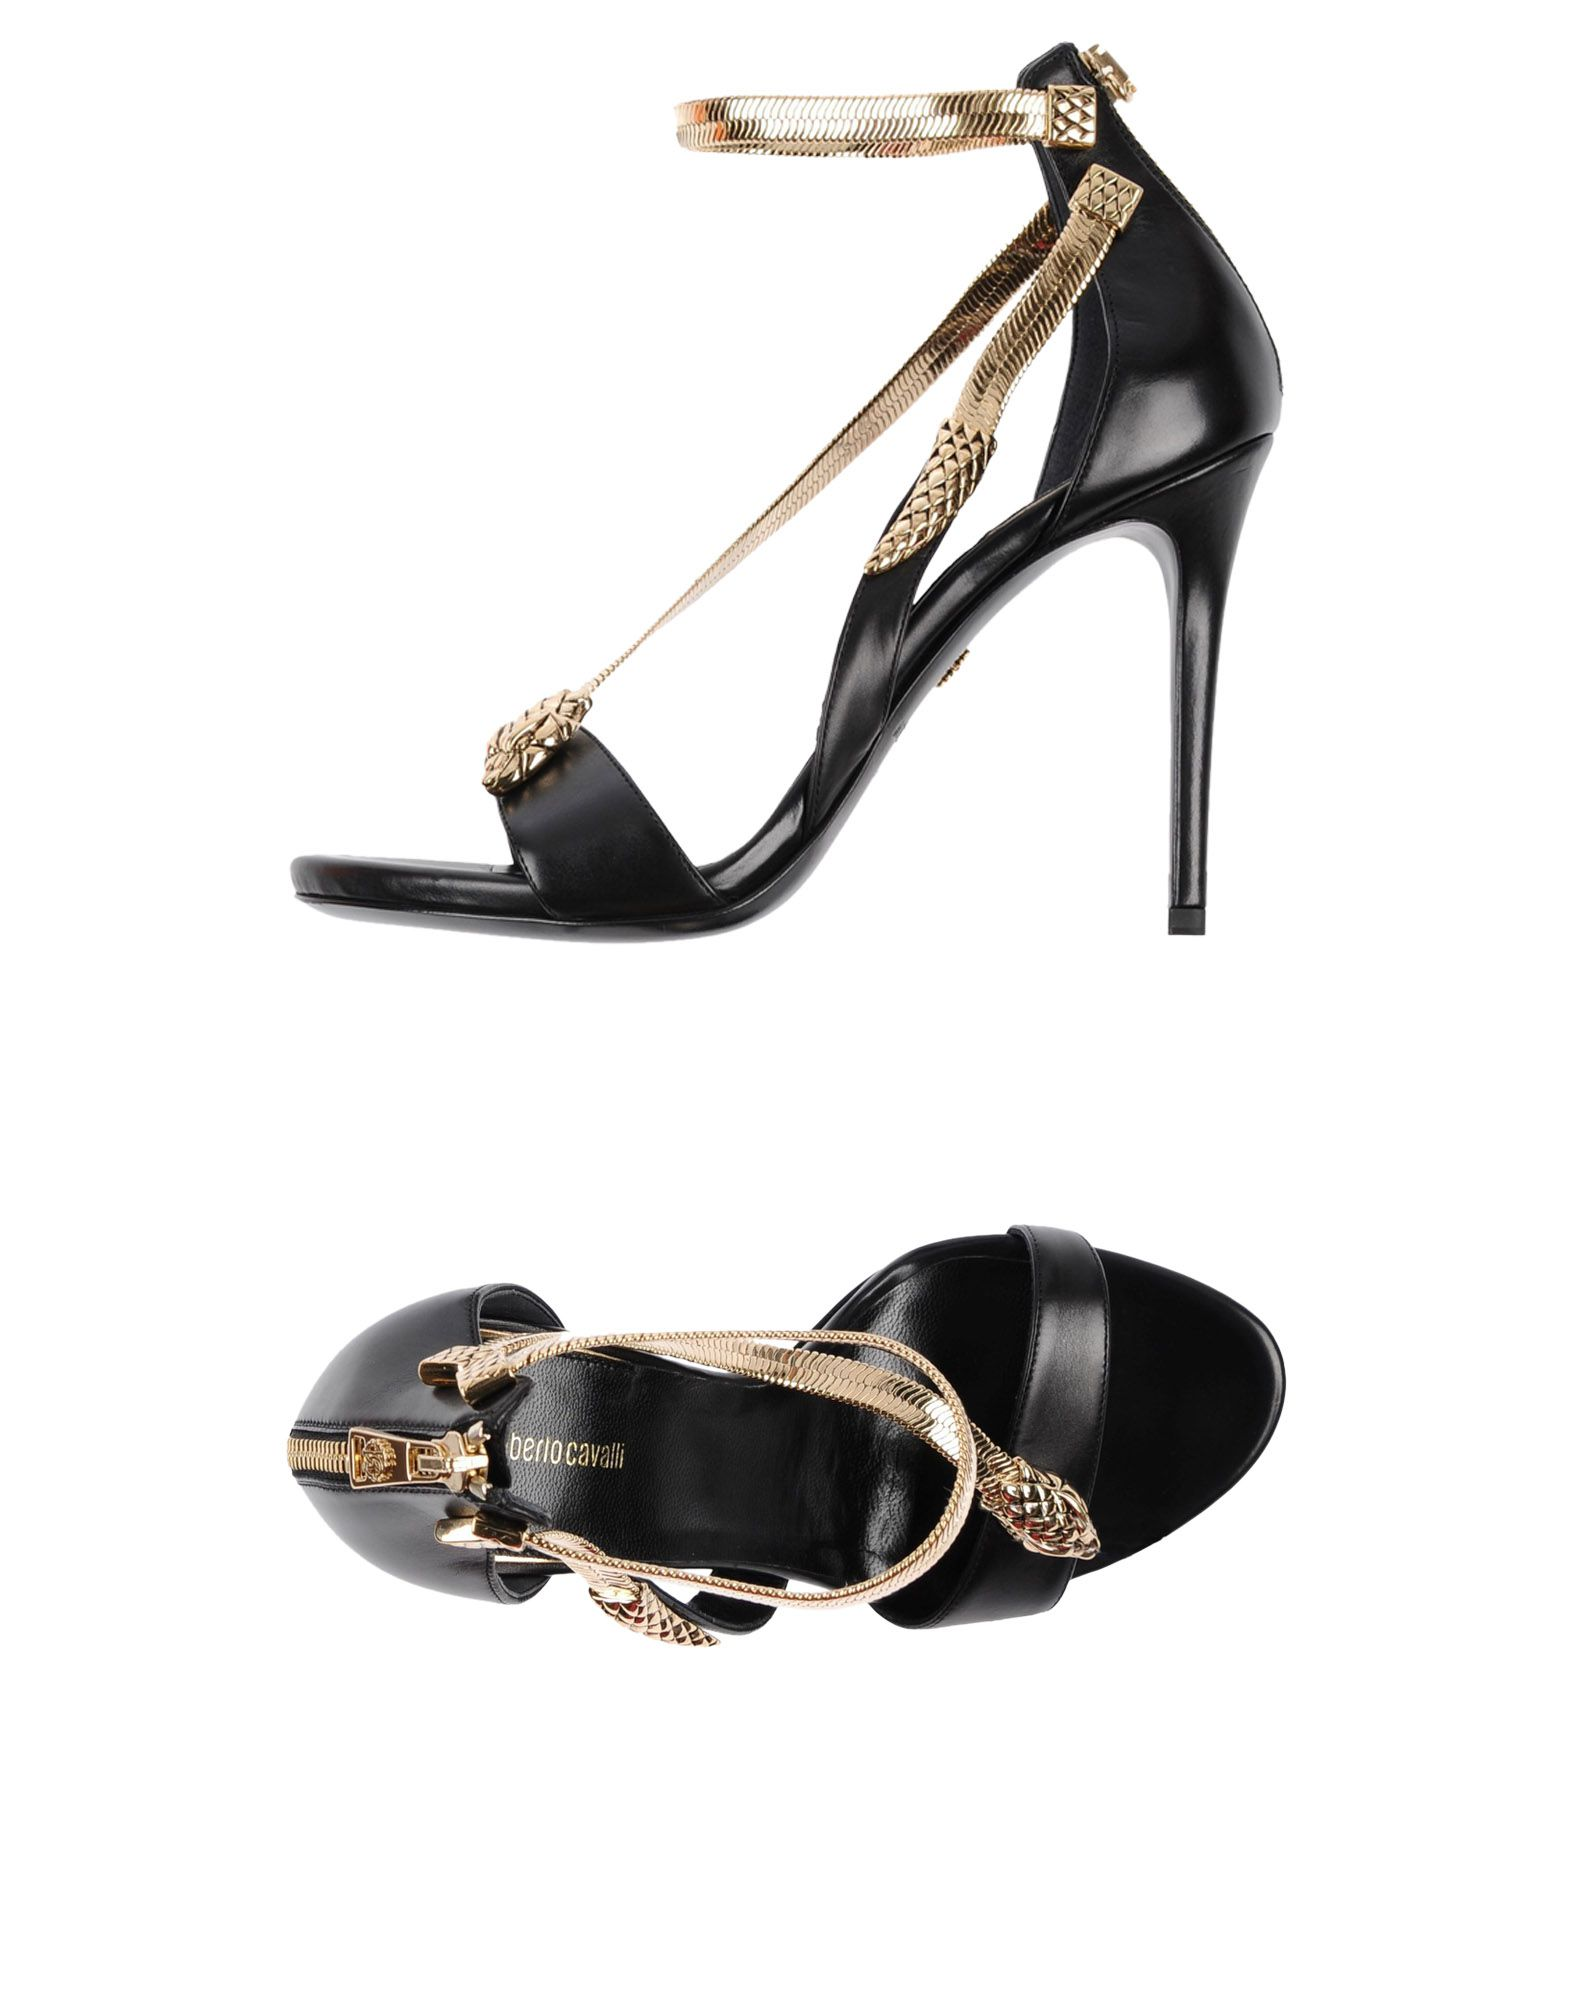 roberto cavalli sandales - femmes roberto cavalli cavalli cavalli sandales en ligne sur l'australie - 11458865gi 0cd9ed